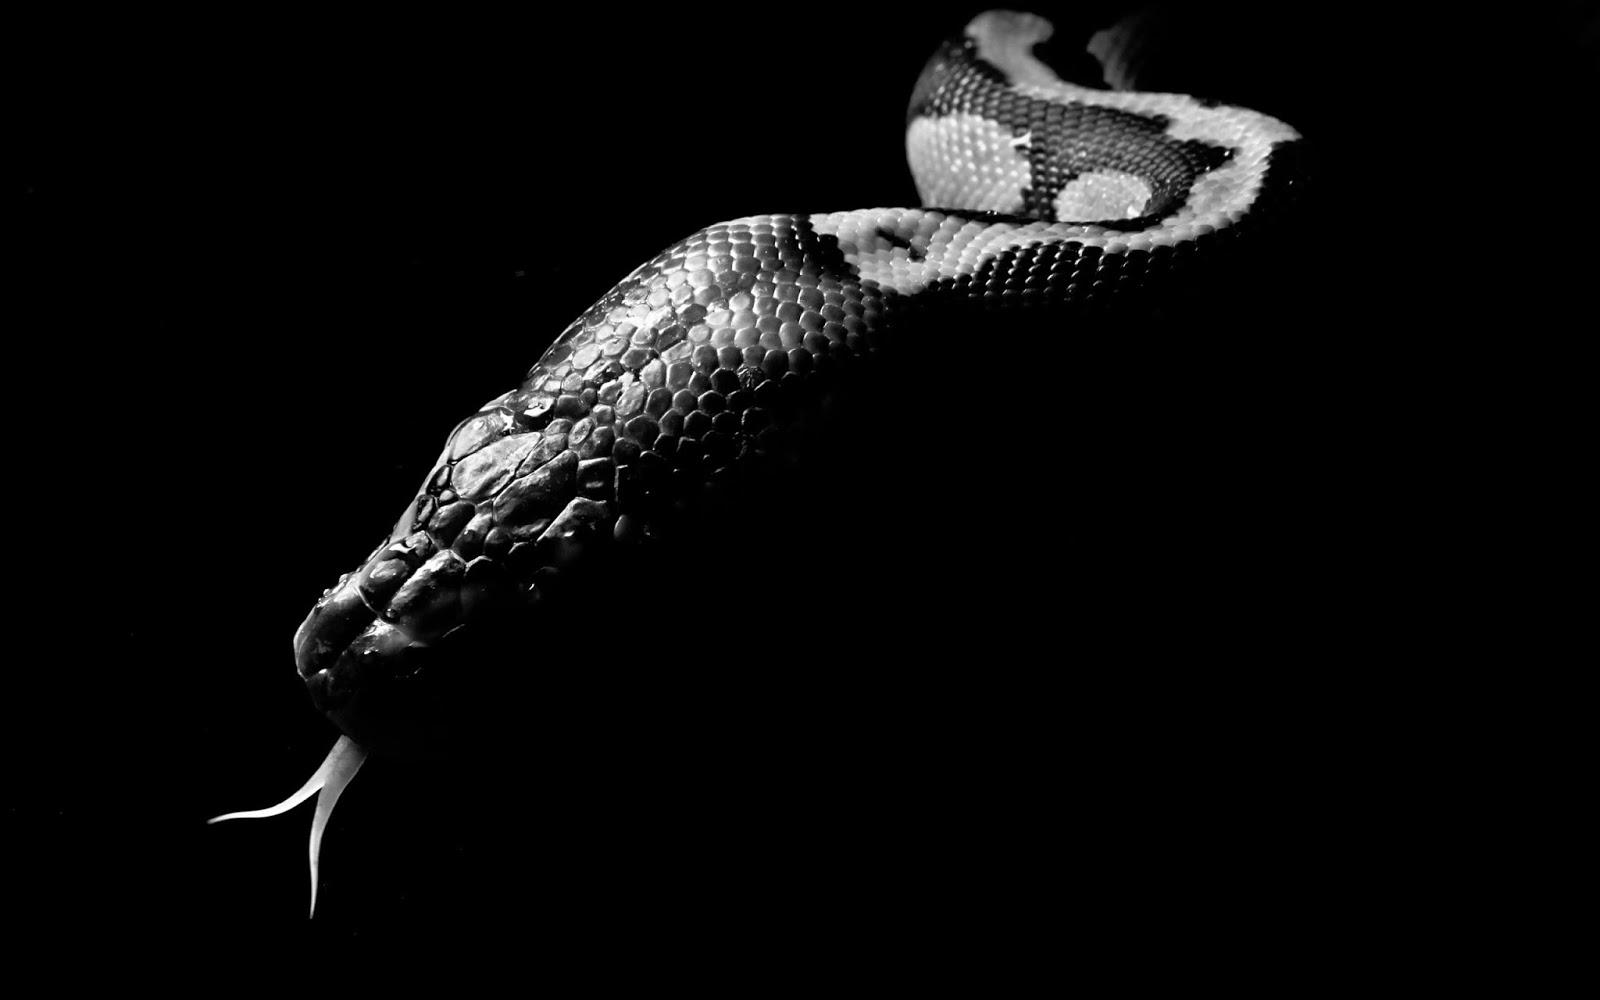 змея кобра обои